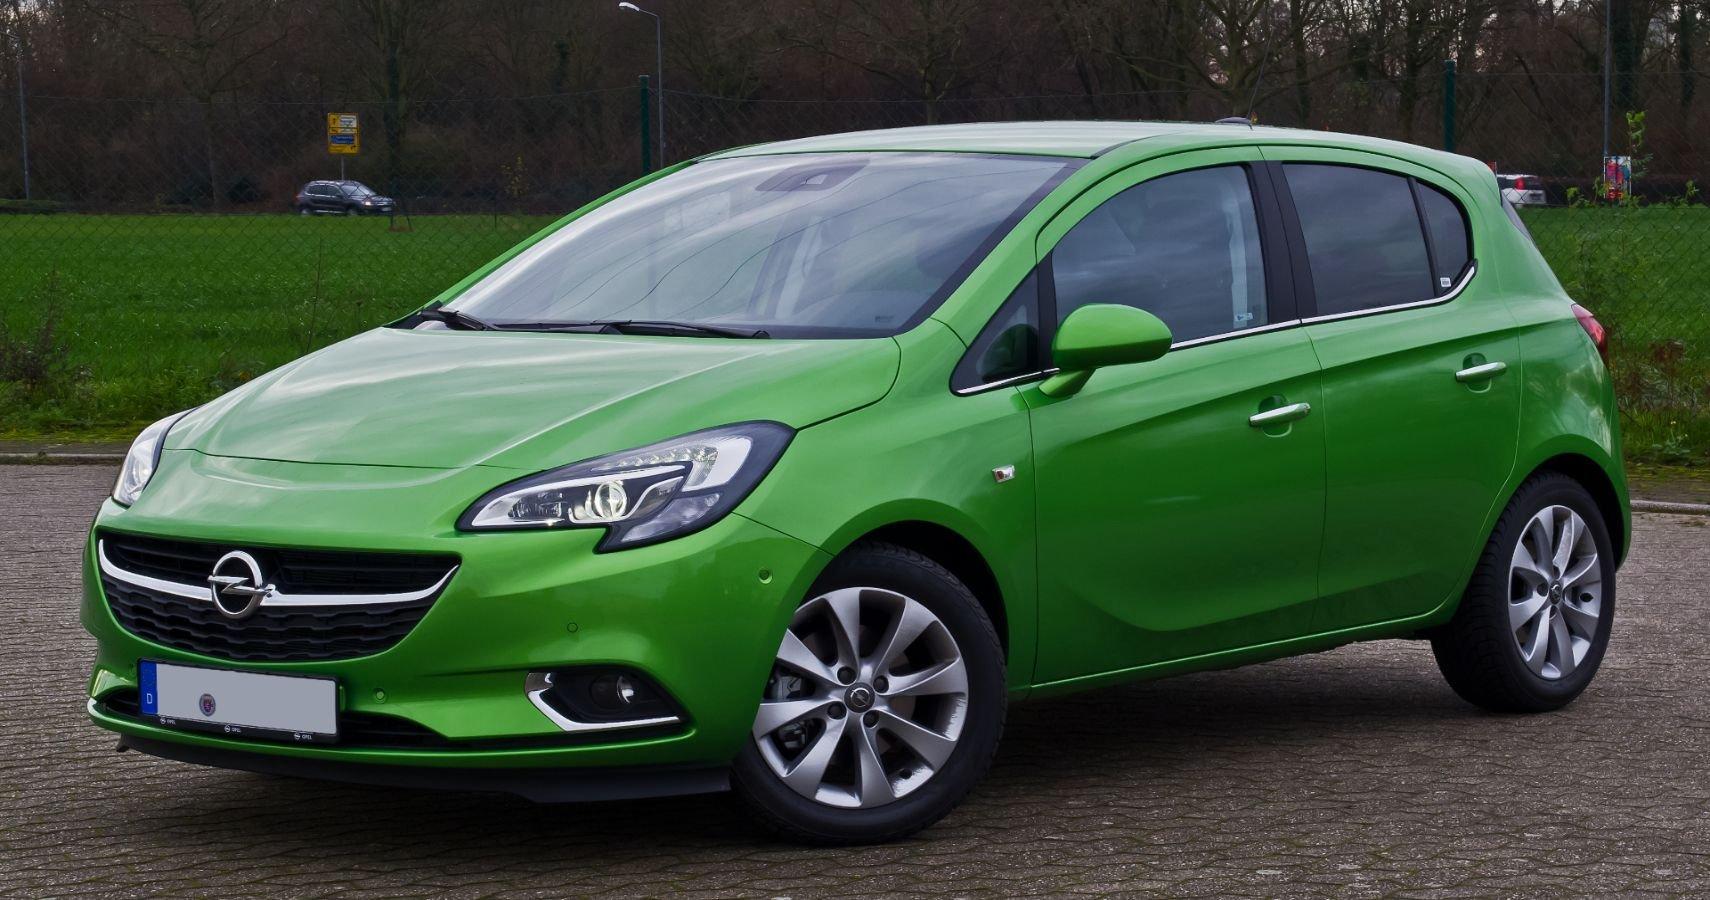 5 Reasons You Should Buy A European Car (And 5 Reasons You Shouldn't)